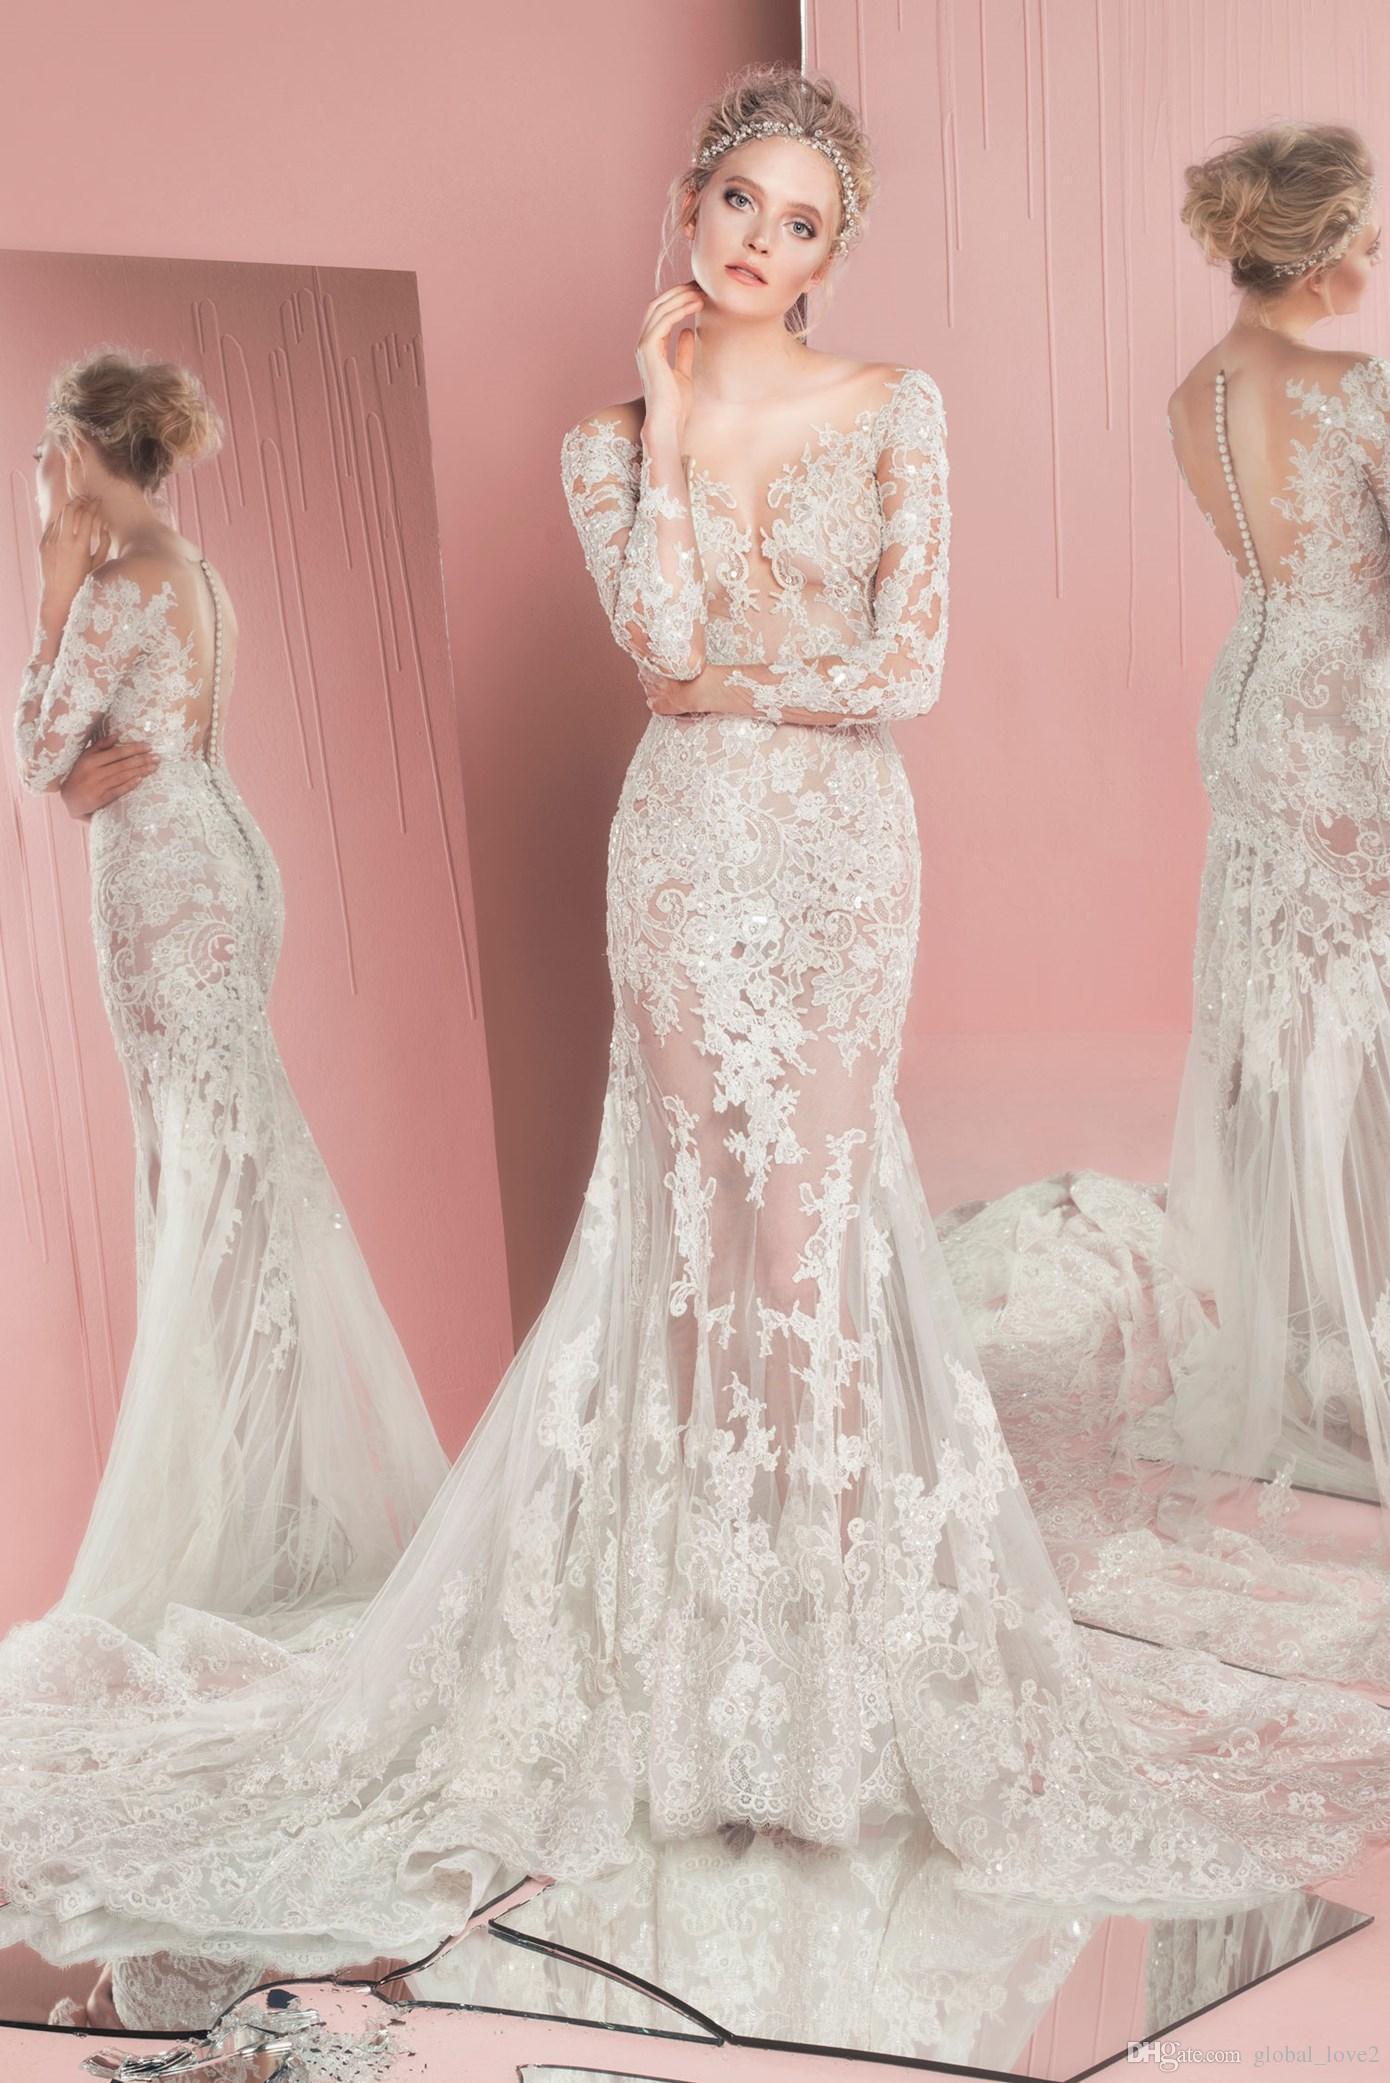 Único Vestidos De Fiesta Vera Wang Inspiración - Colección de ...